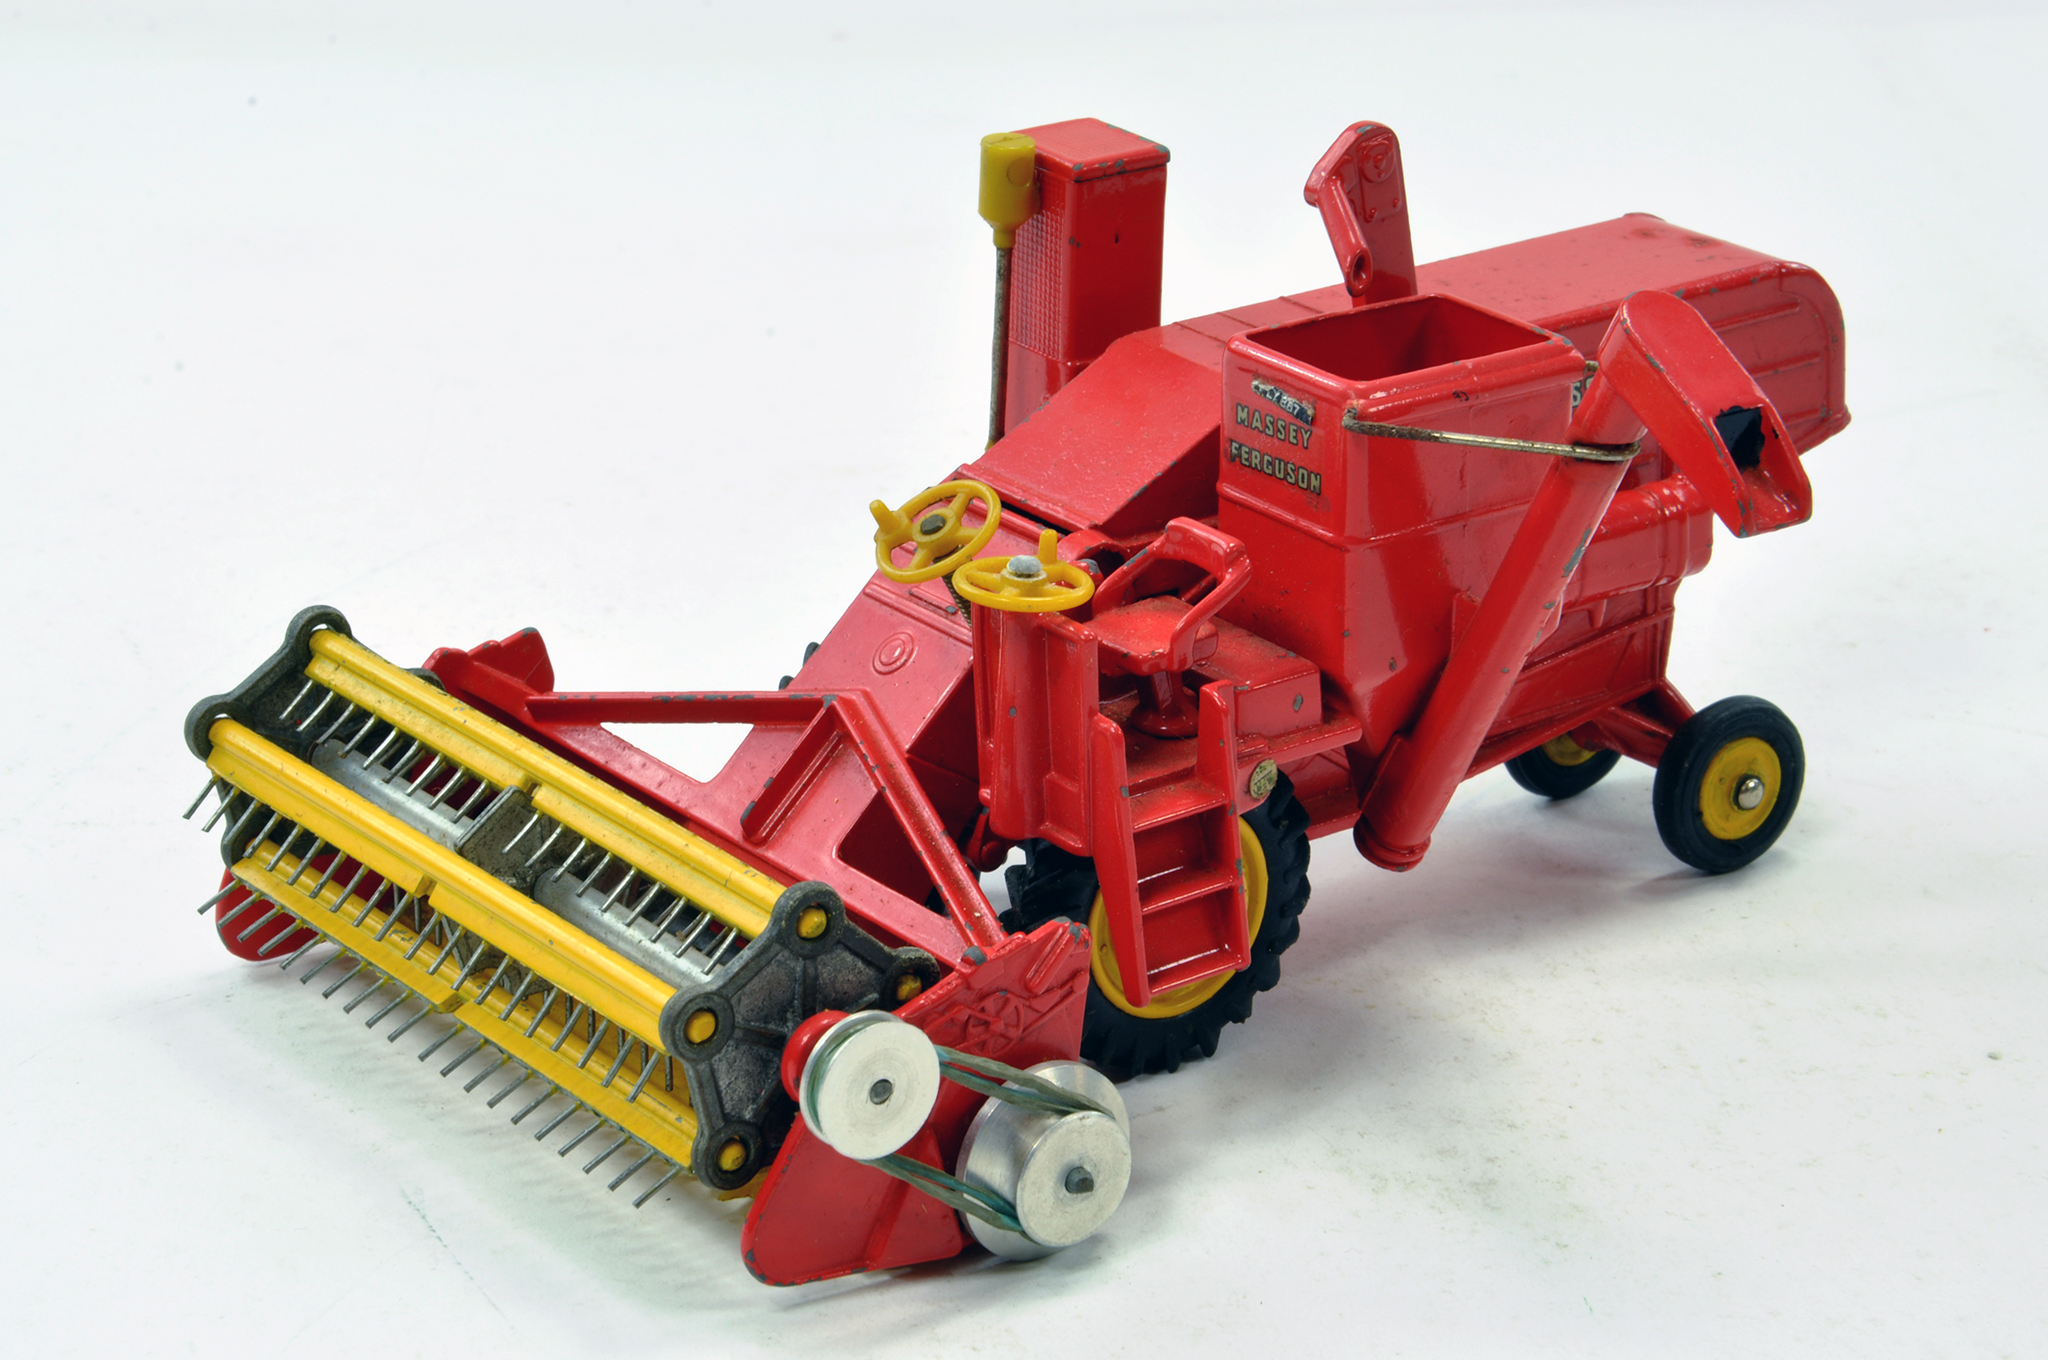 Lot 230 - Corgi Diecast Massey Ferguson 780 Combine Harvester. Generally good to very good.